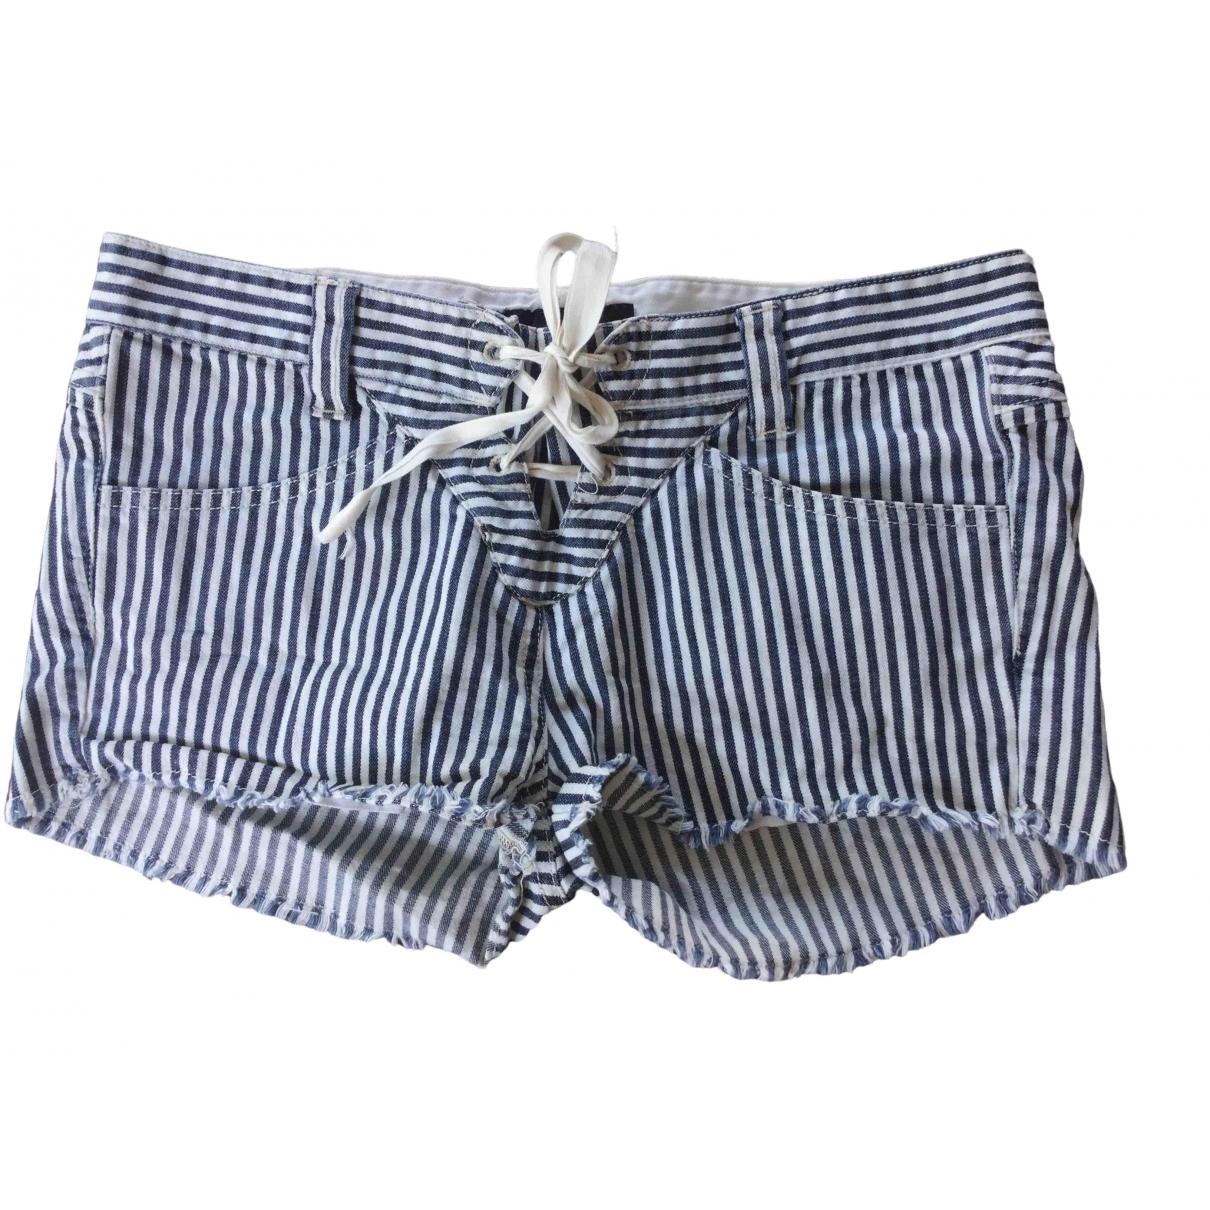 Isabel Marant \N Shorts in  Marine Baumwolle - Elasthan